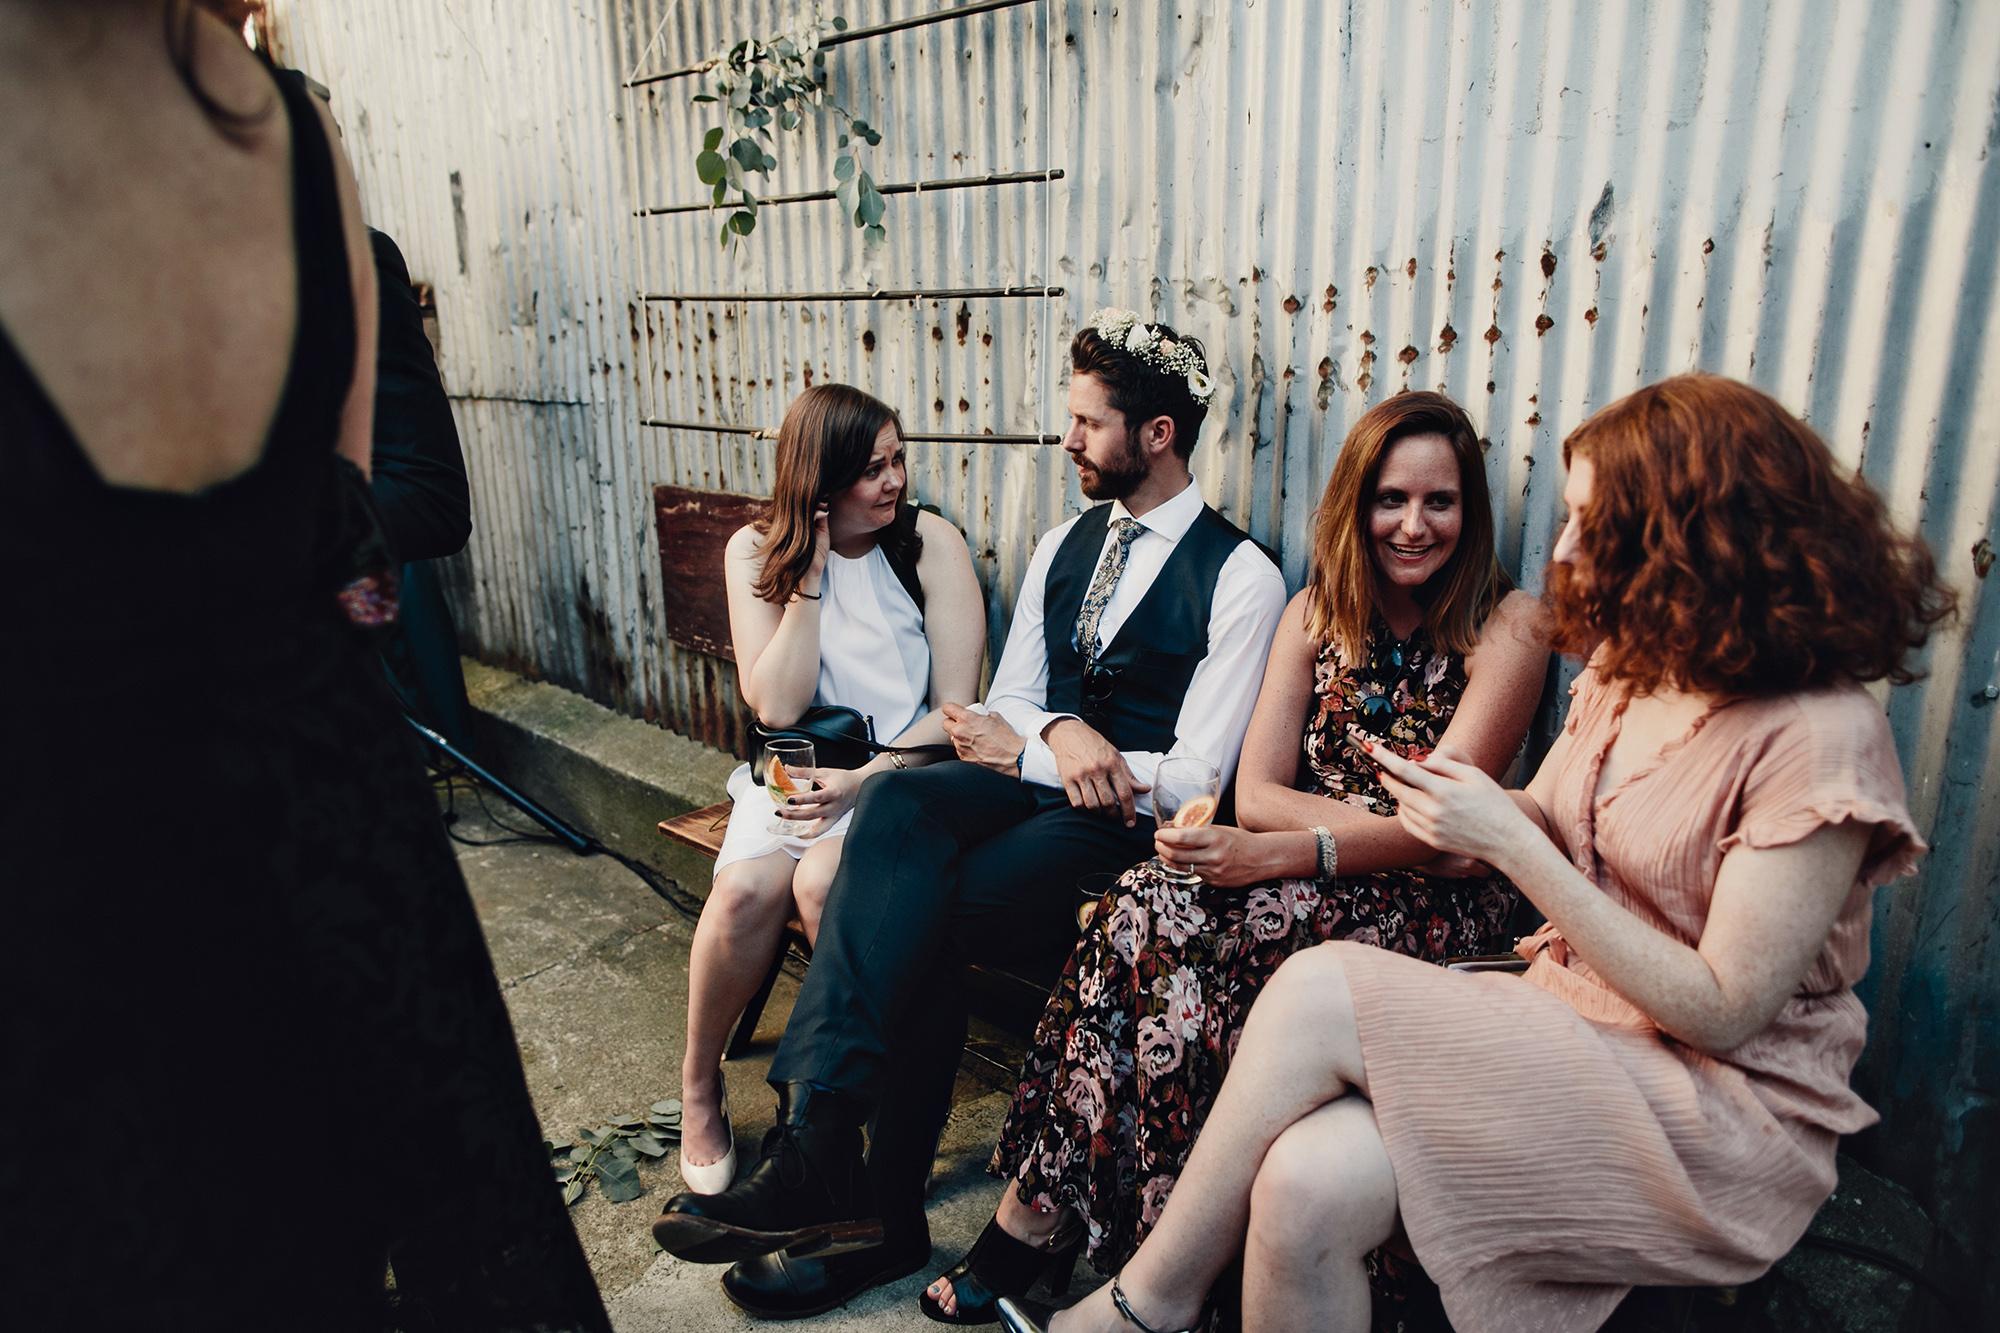 Bonaccord-Vancouver-Wedding-0103.JPG